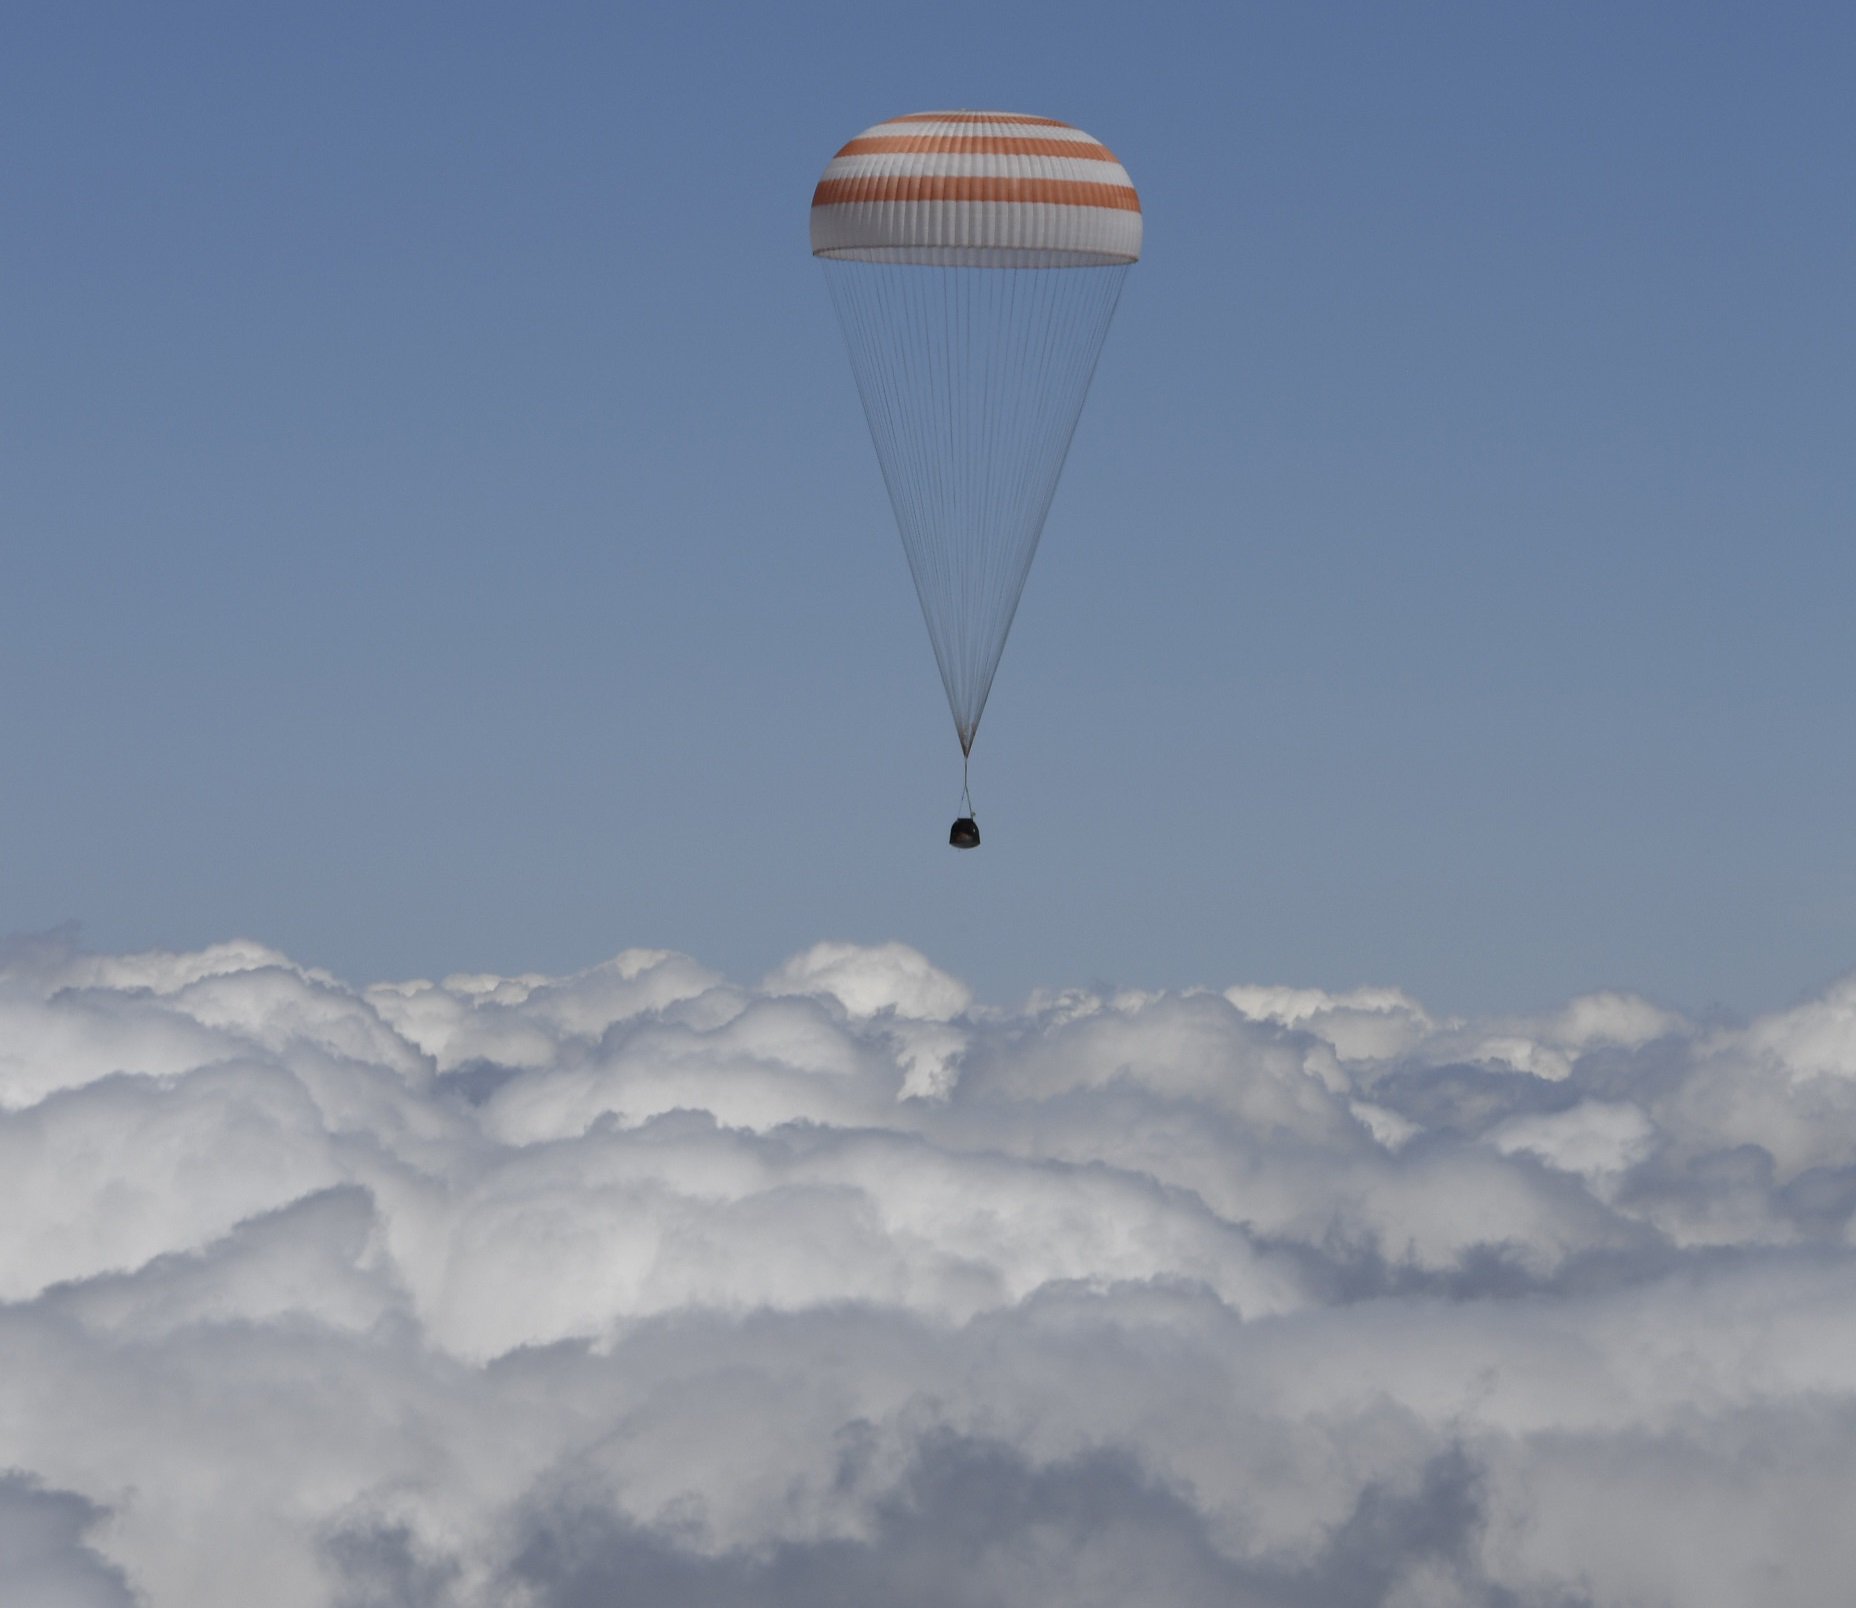 Landing_of_the_Soyuz_TMA-19M_spacecraft9